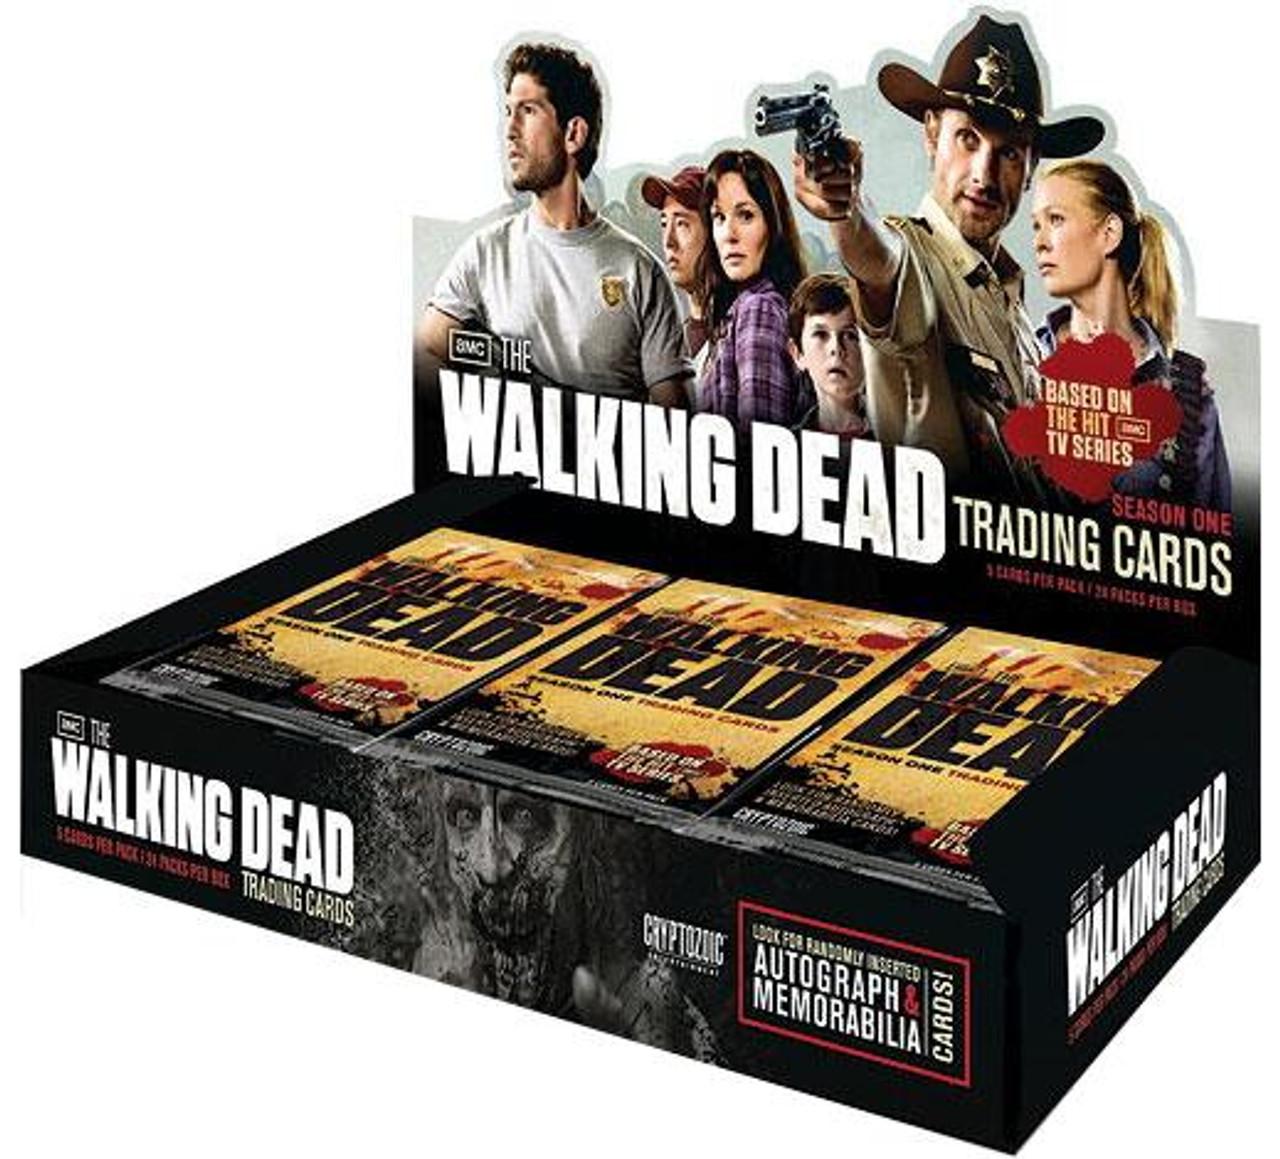 The Walking Dead AMC TV TV Season 1 Trading Card Box Trading Card Box